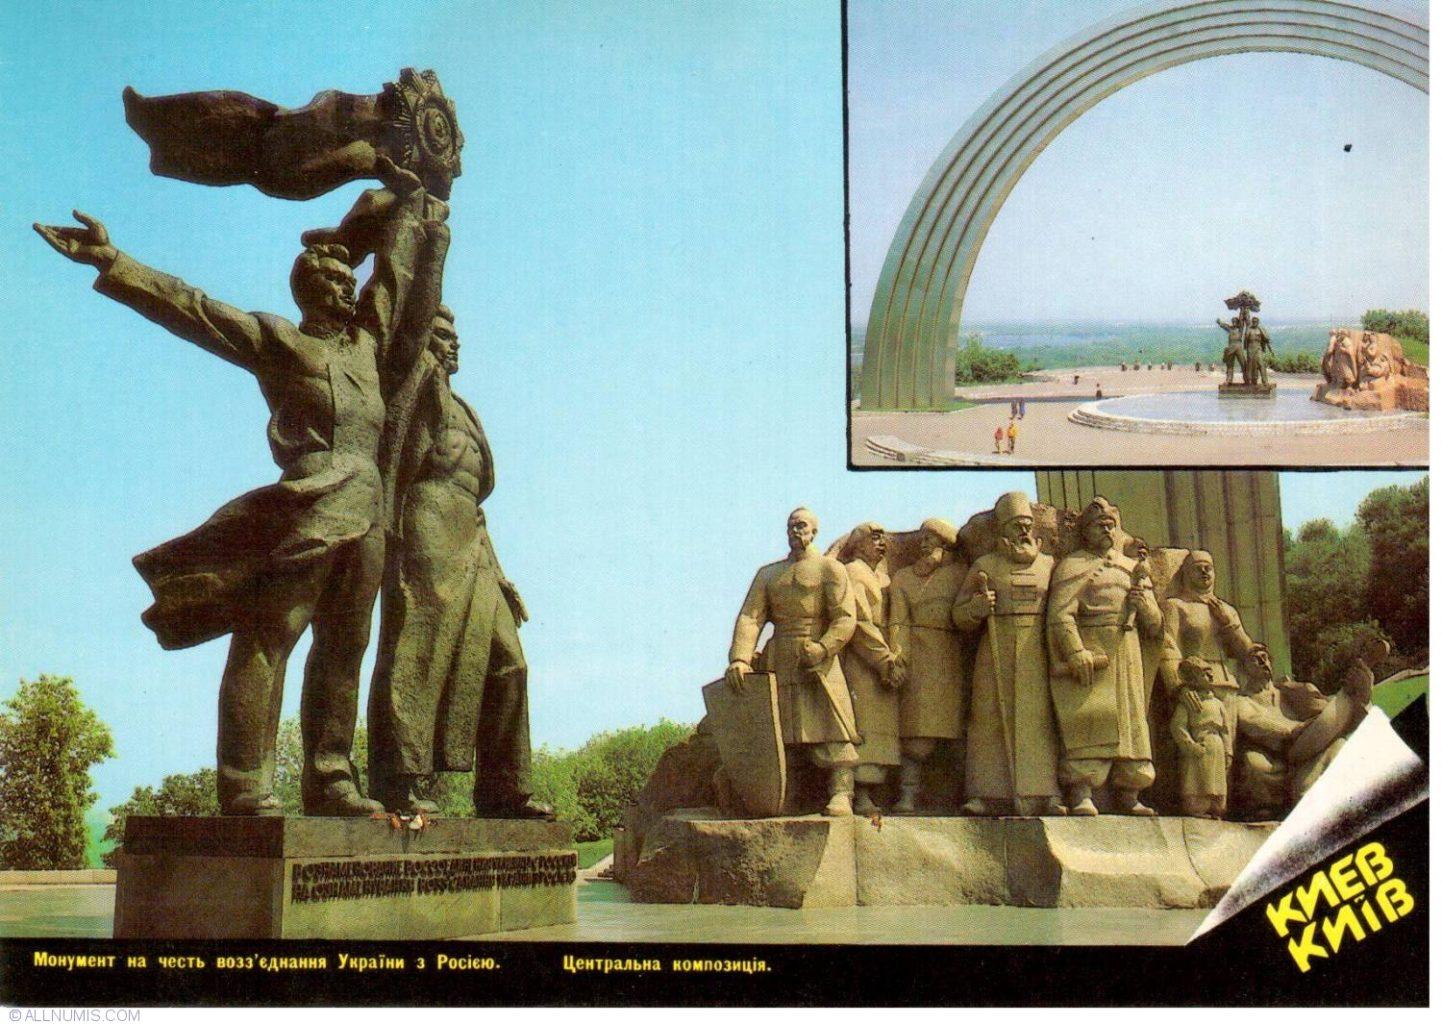 фото скульптуры трудящихся Арка Дружбы народов